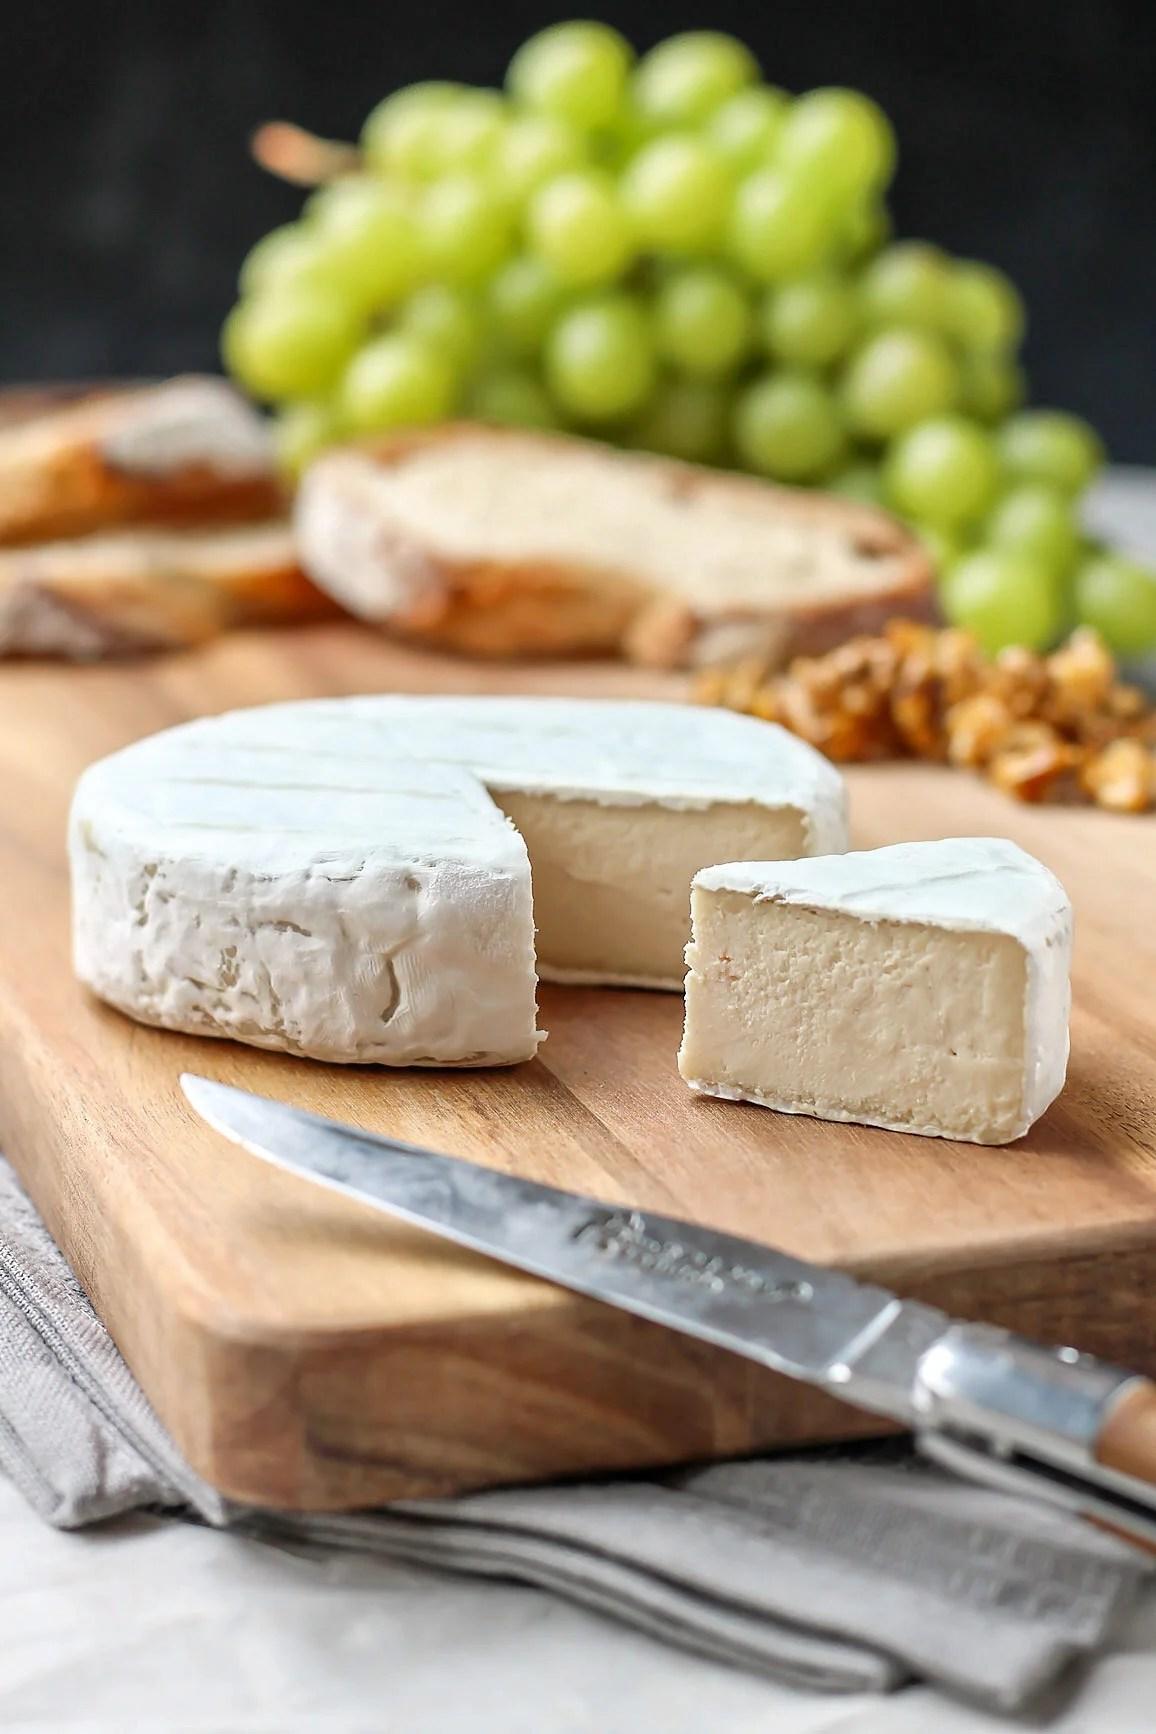 Vegan Camembert on a wooden board